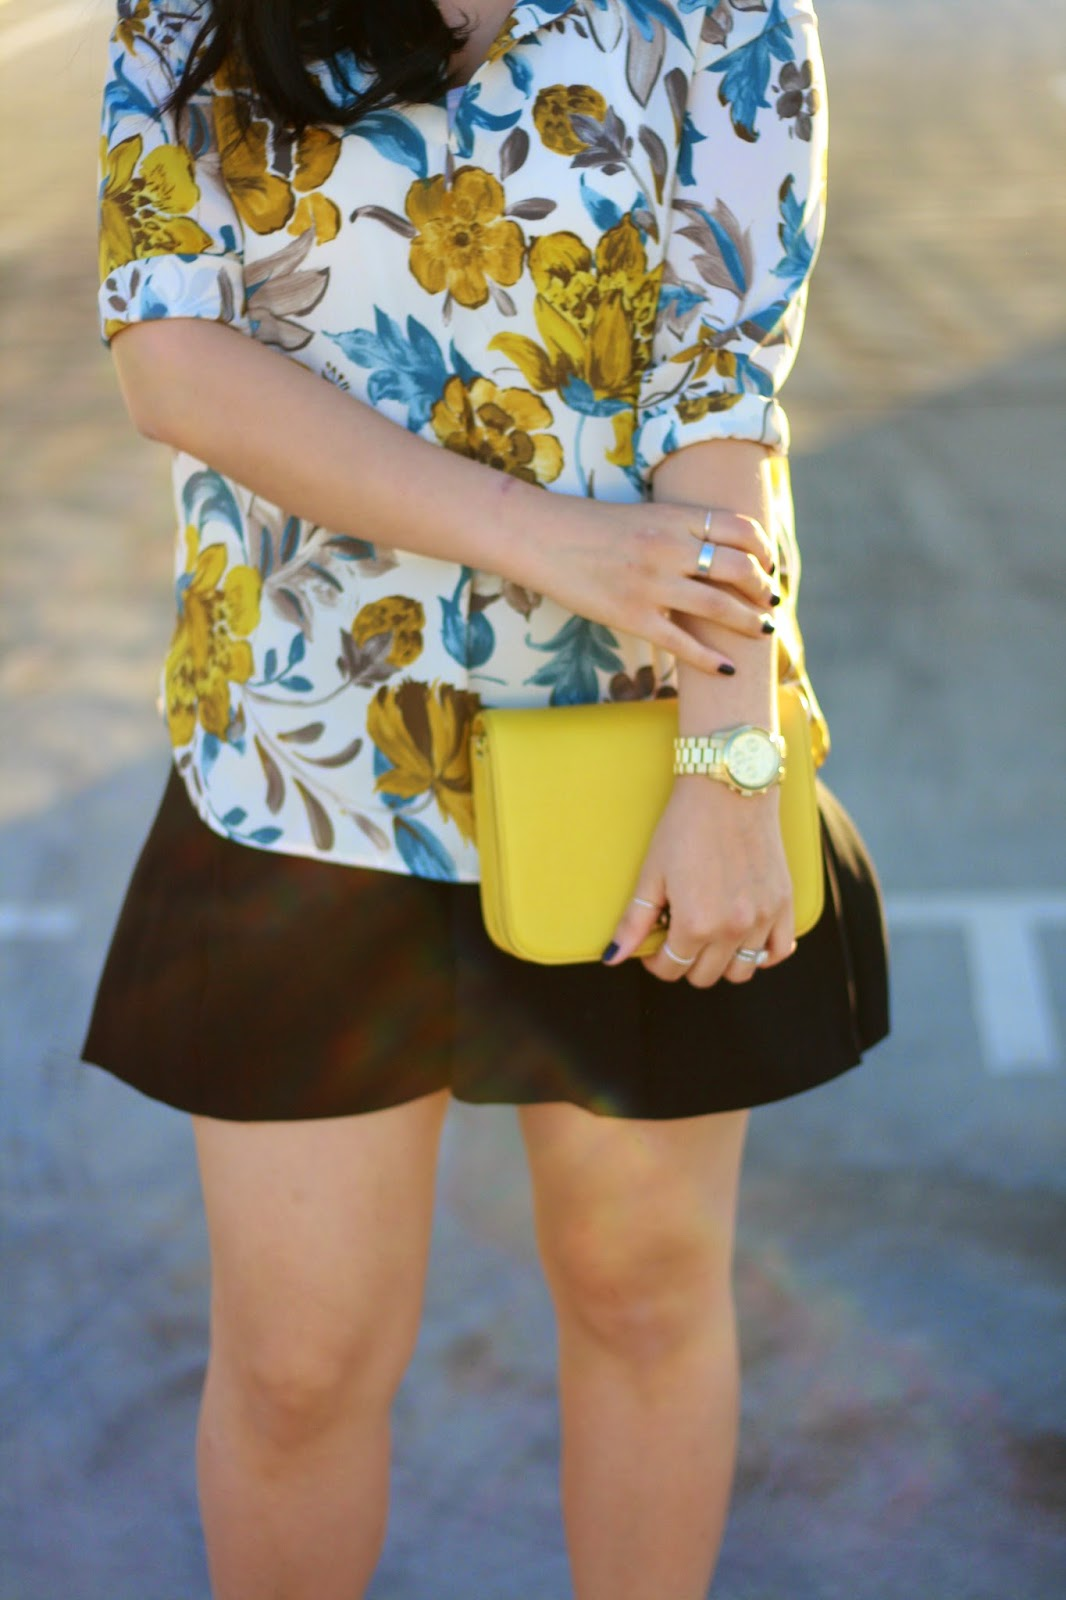 simplyxclassic, blogger, zara floral top, ray ban sunnies, zara shorts, crew bag, styleblogger, orange county, mommy blogger